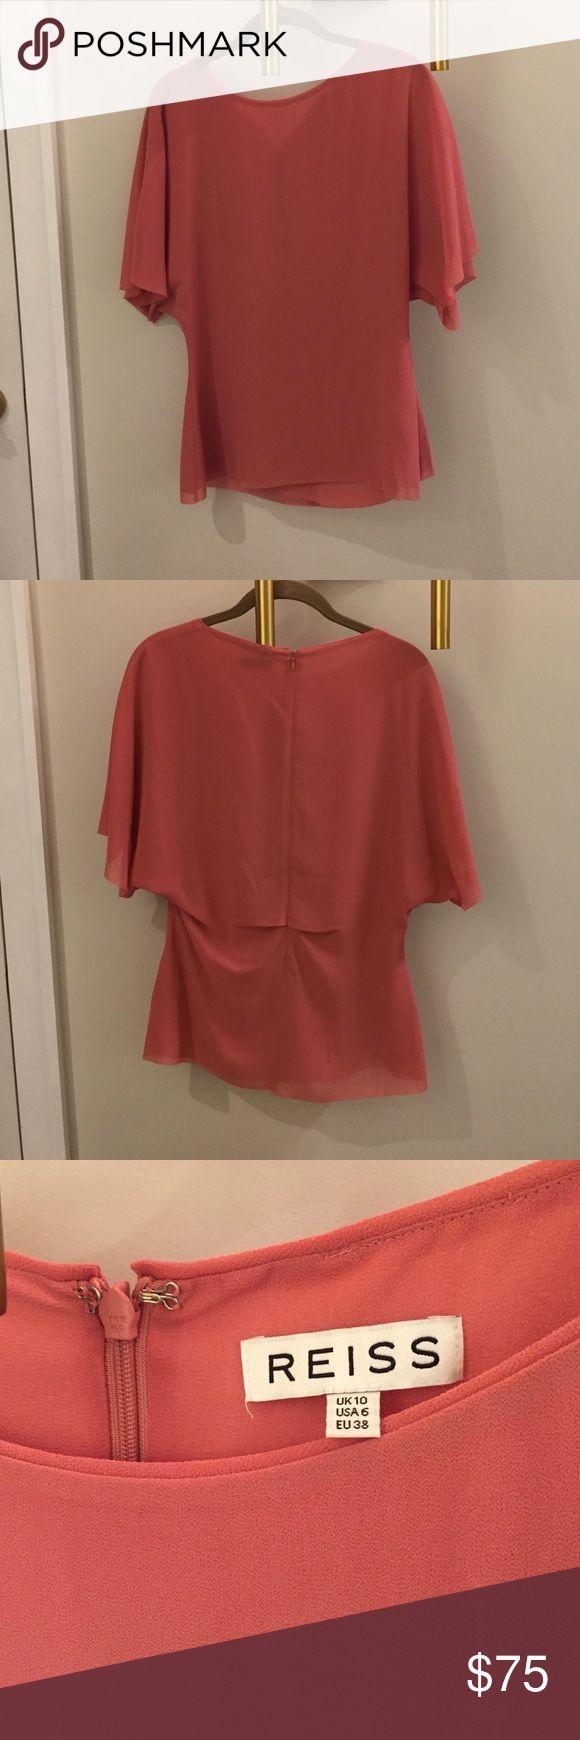 Top Beautiful simple top- rustic red/pink tone Reiss Tops Blouses